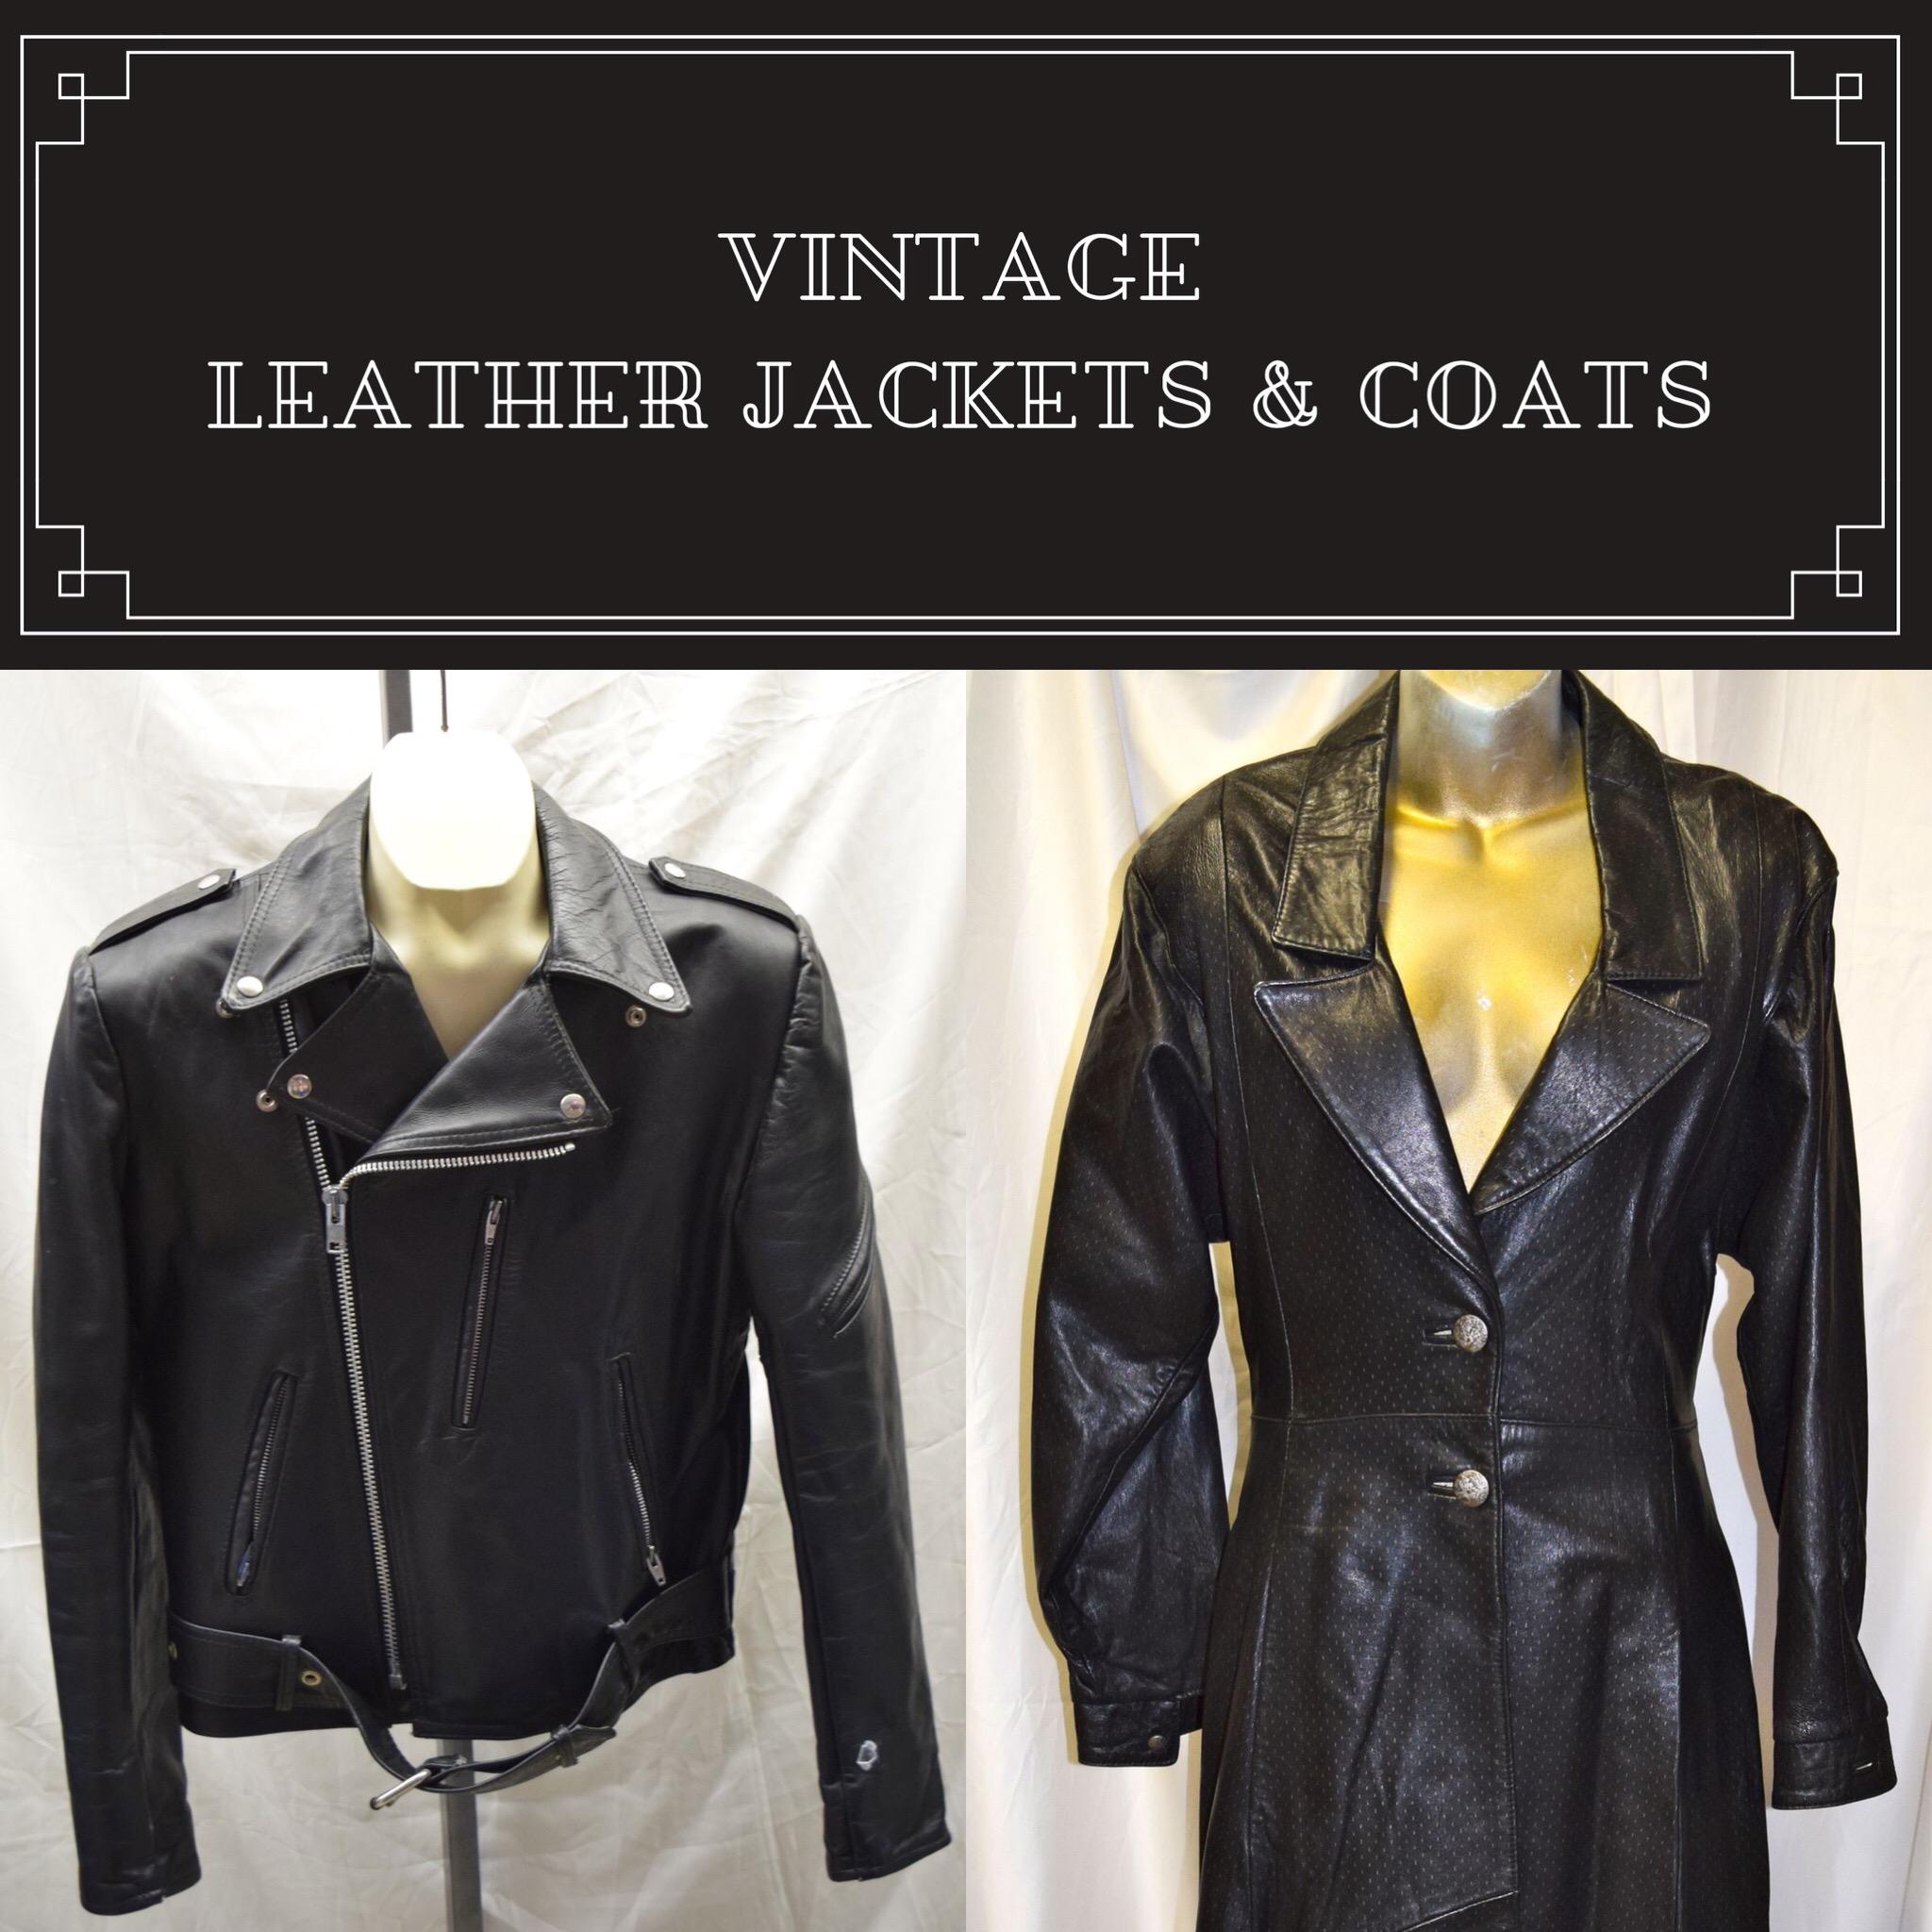 Vintage Leather Jackets & Coats